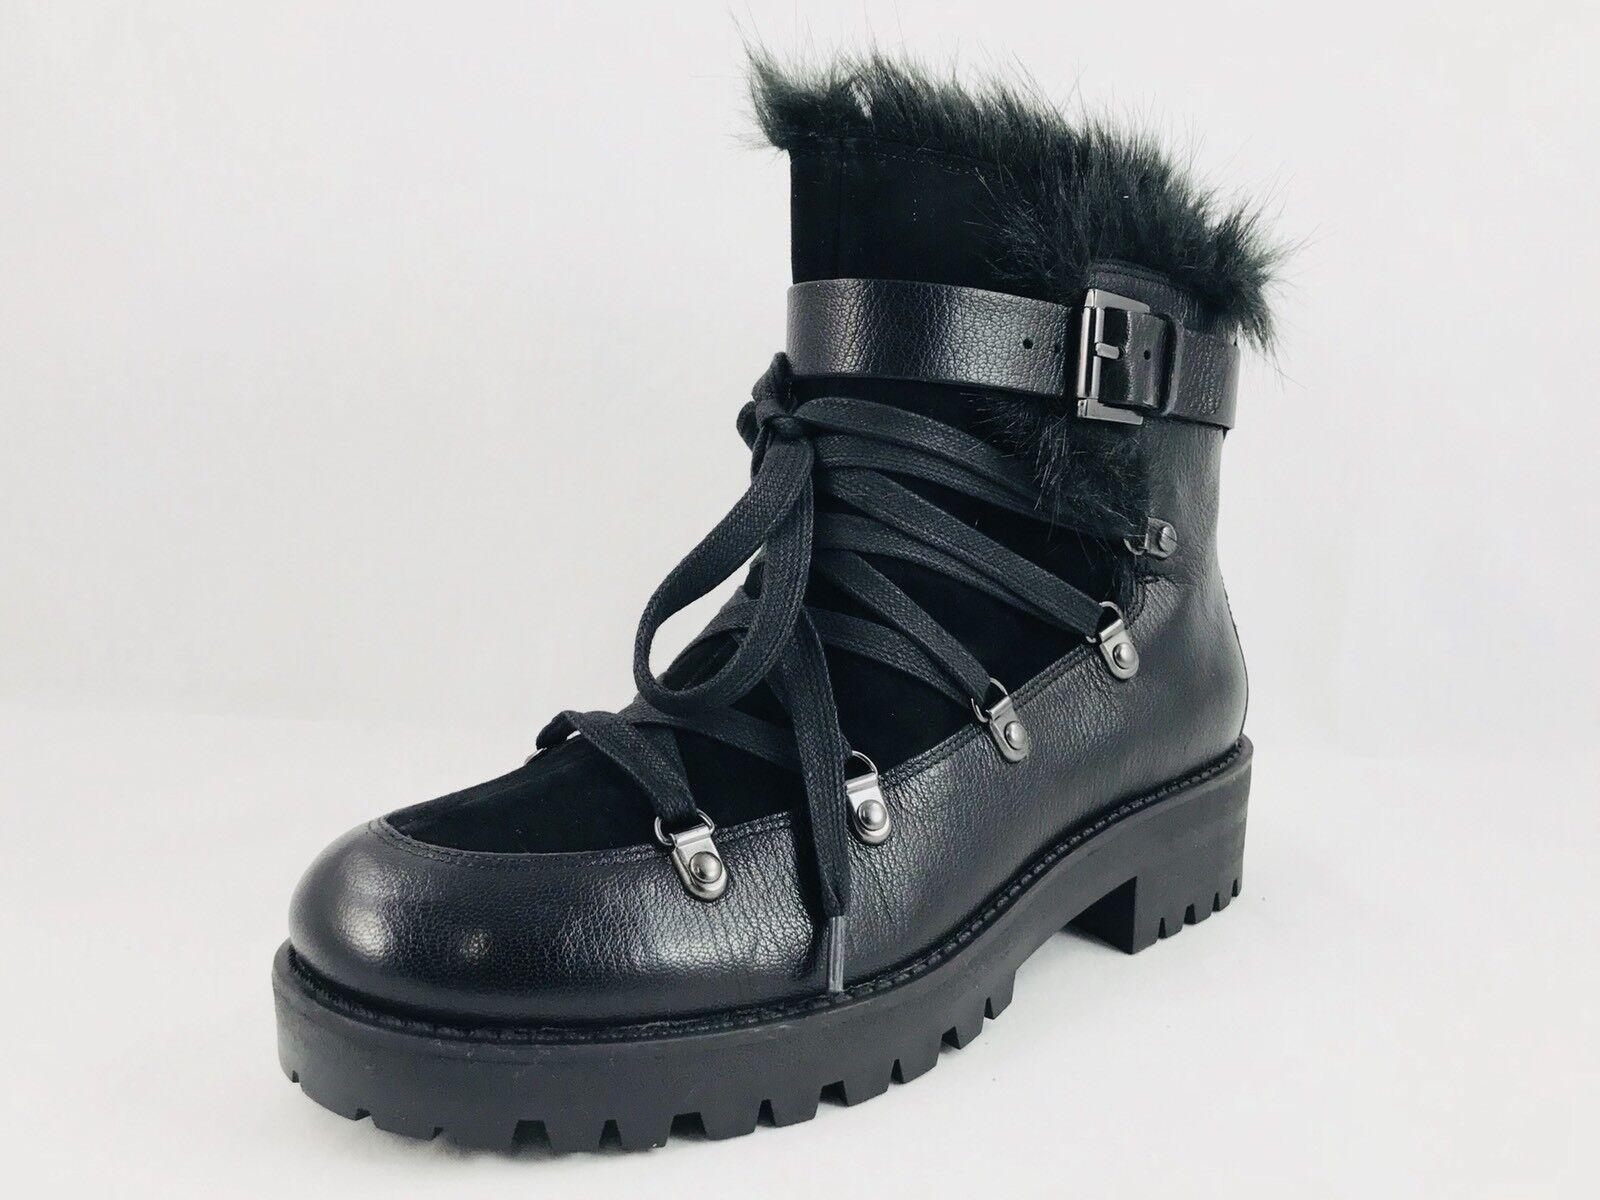 Nine West Orynne Leather Ankle Boot Black Size 6.5 NIB